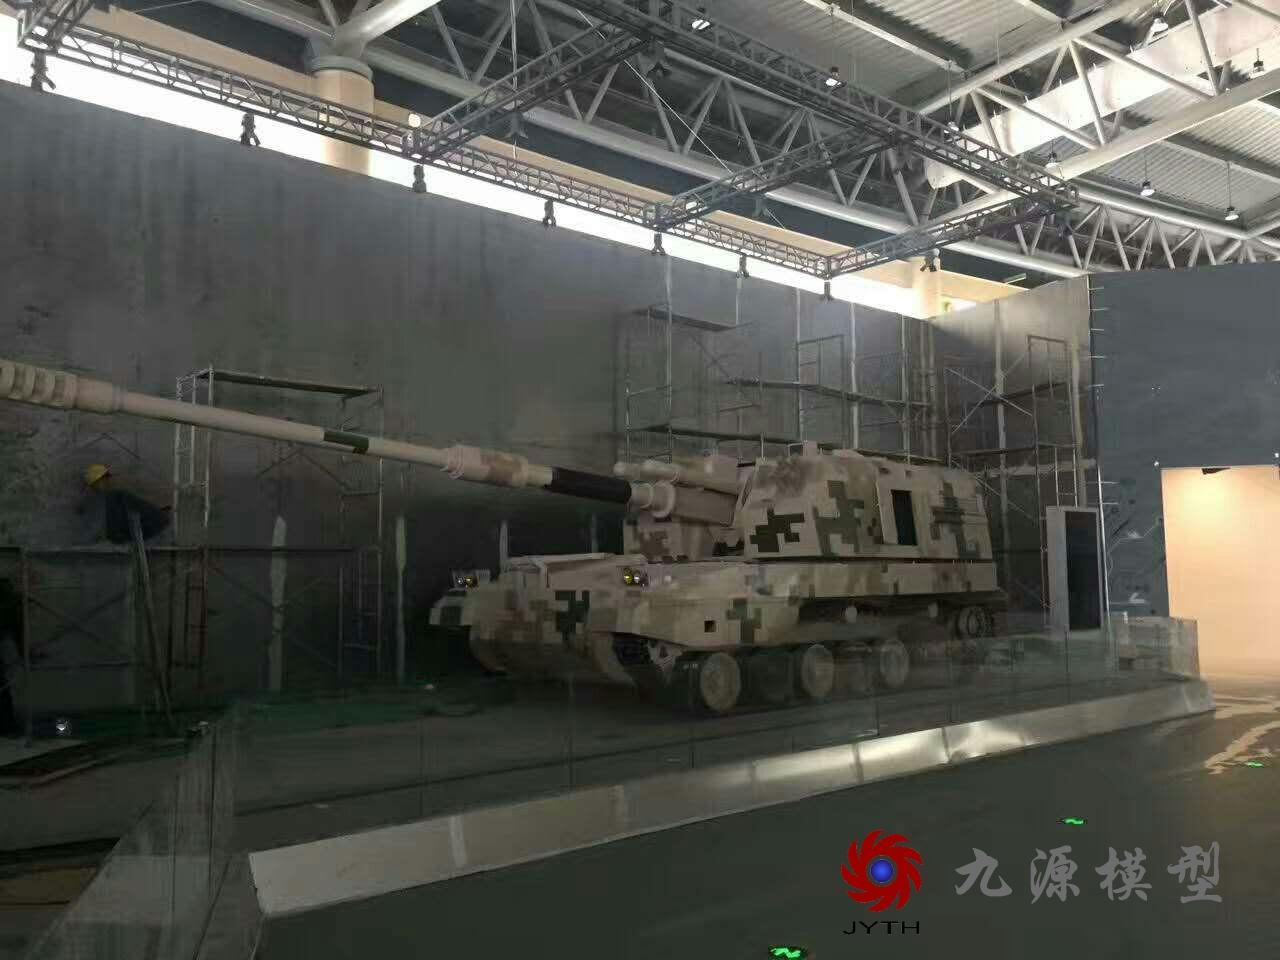 99试坦克-mmexport1489760749884